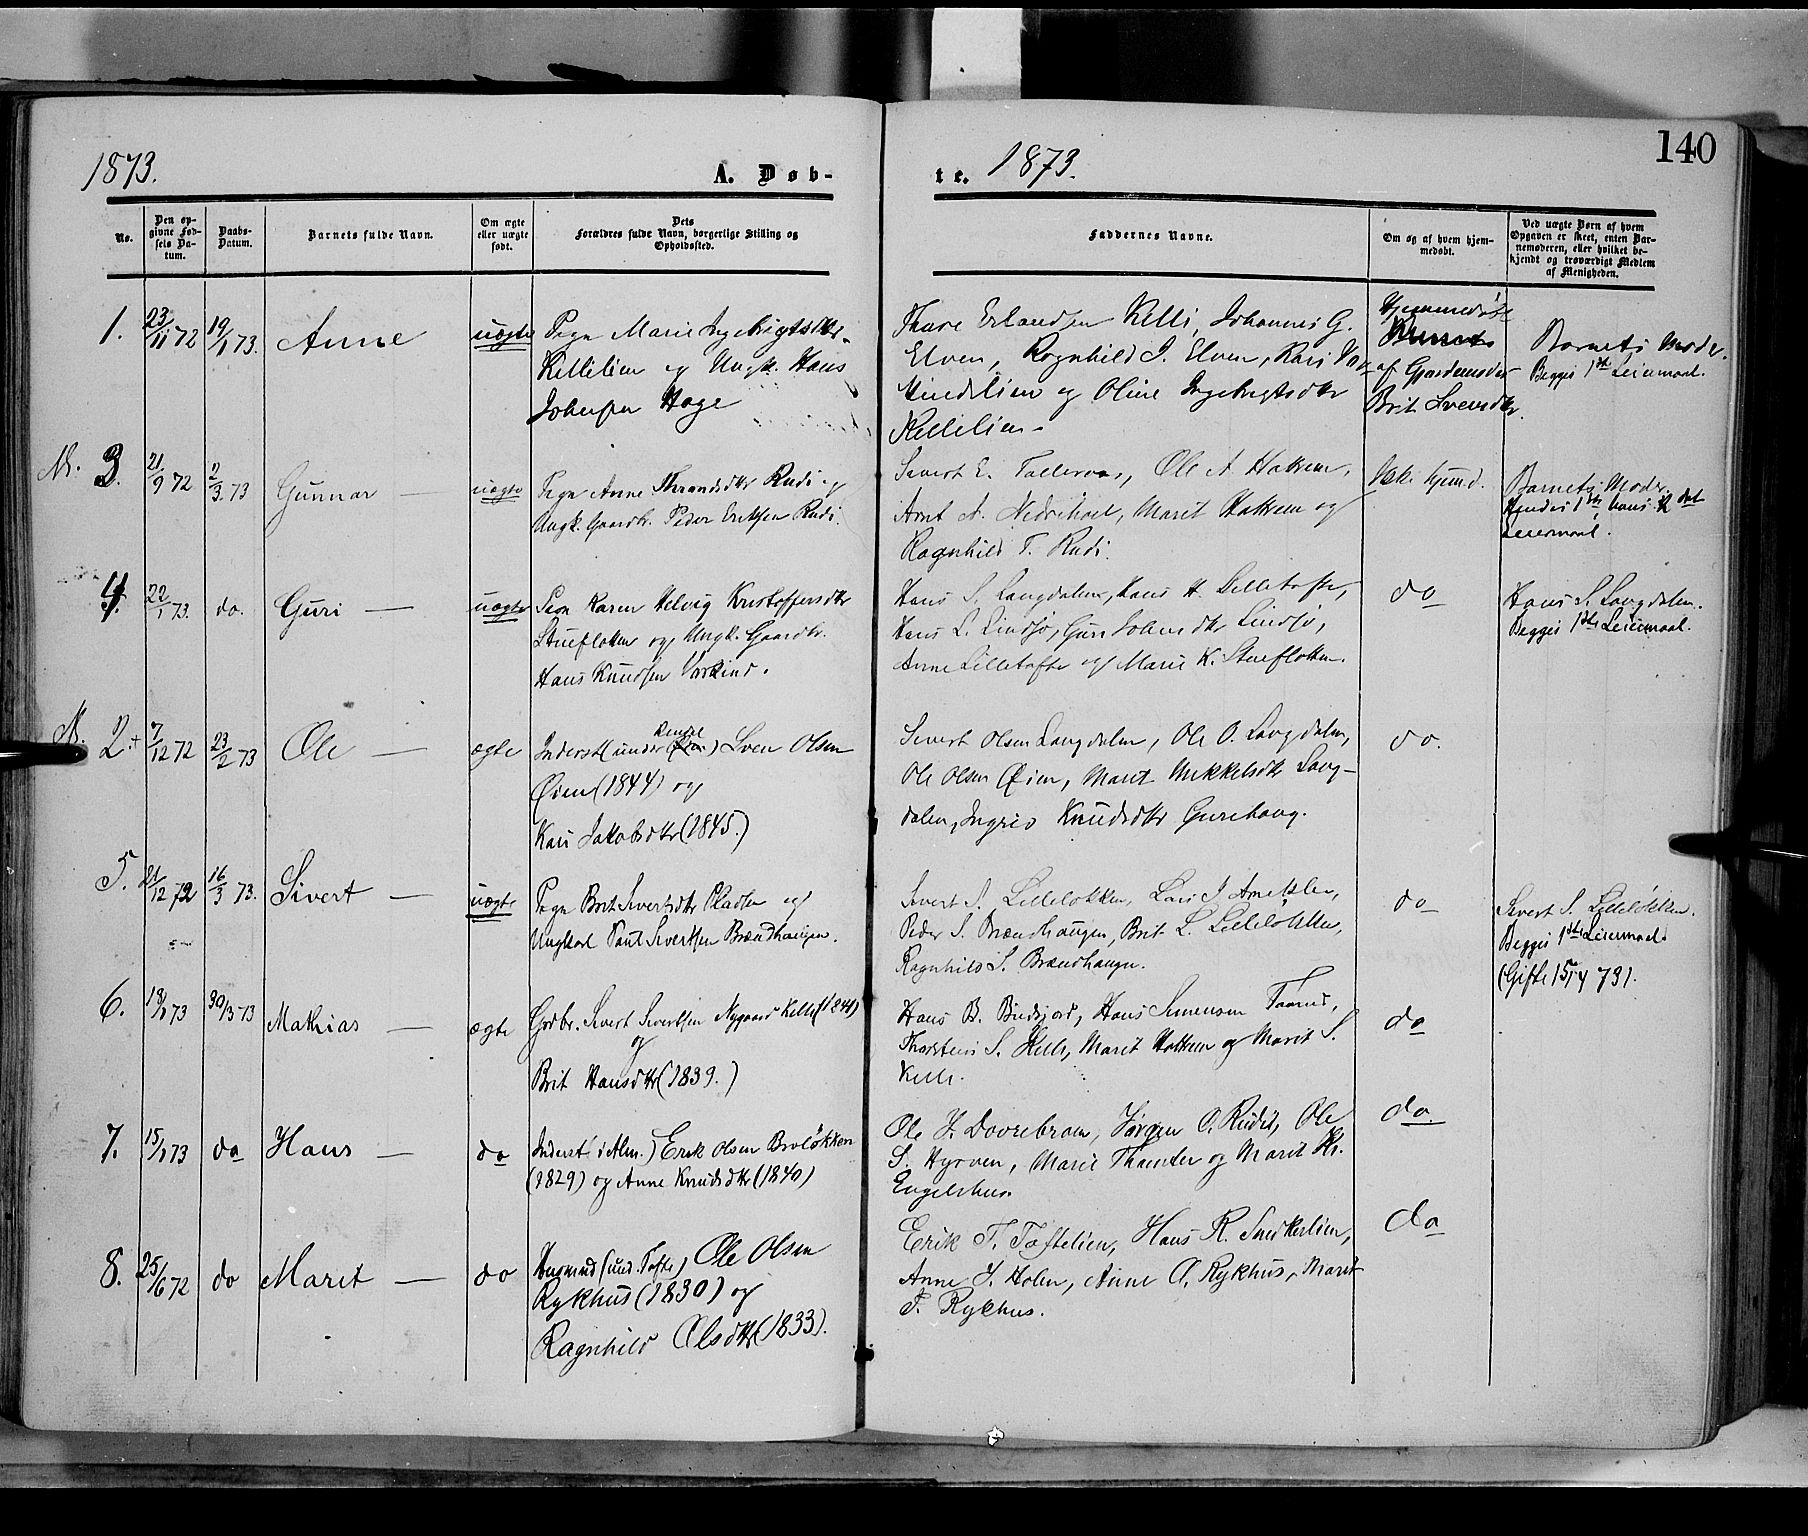 SAH, Dovre prestekontor, Ministerialbok nr. 1, 1854-1878, s. 140